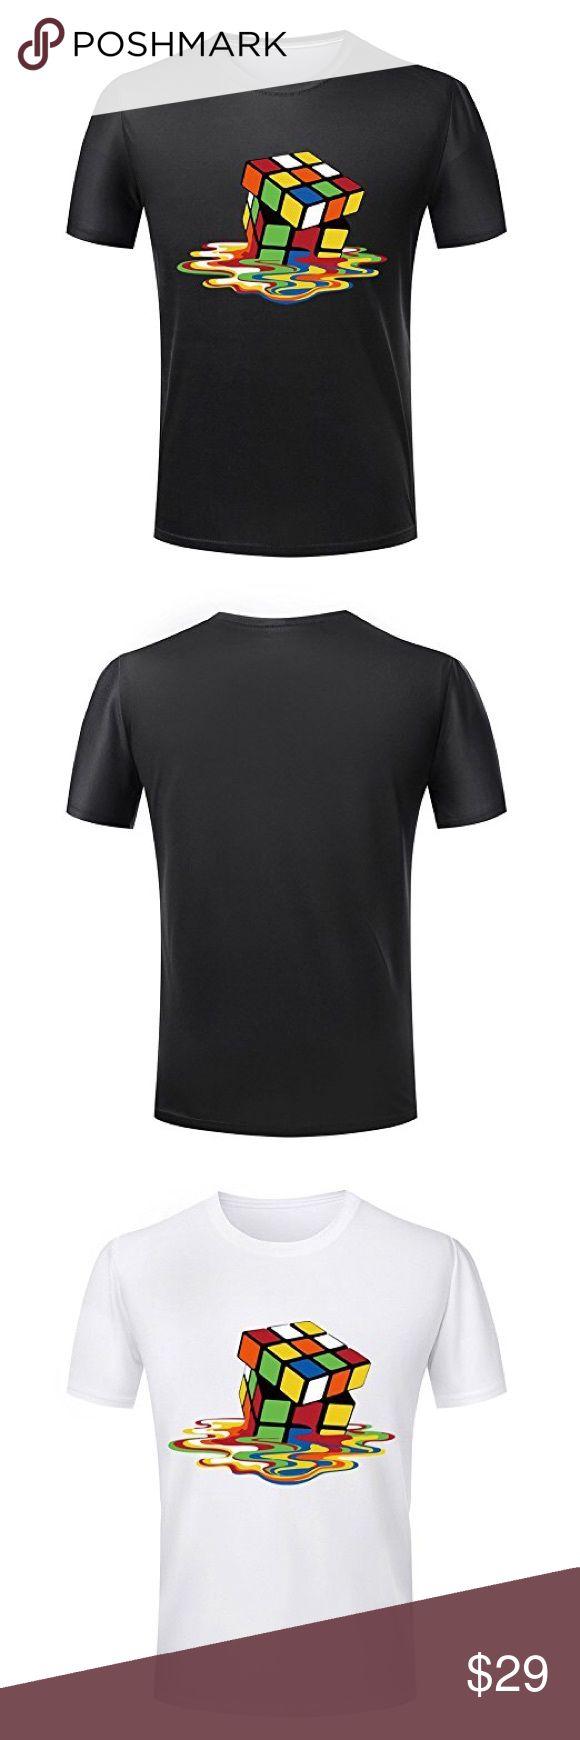 Design a t shirt rubric - Melting Rubix Cube T Shirt Boutique